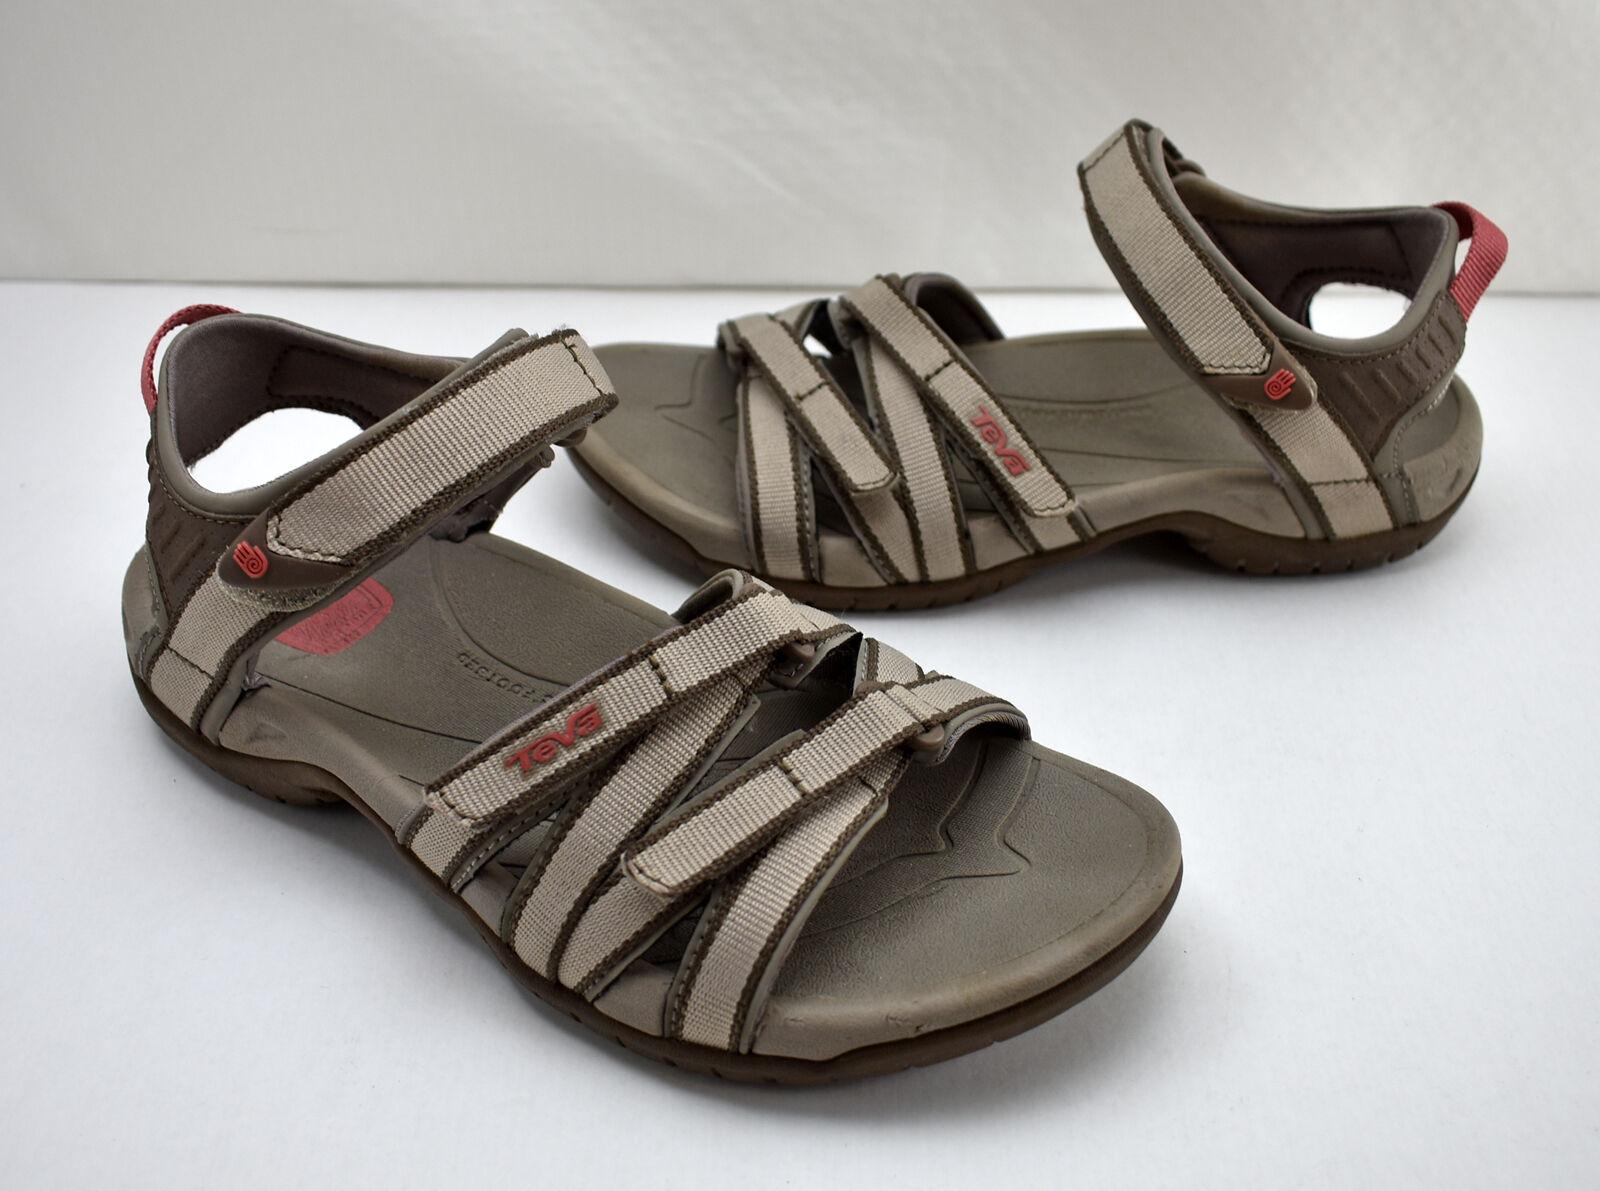 Teva Tirra 4266 Taupe Open Toe Hook & Loop Ankle Strap Sport Sandals - Women's 6